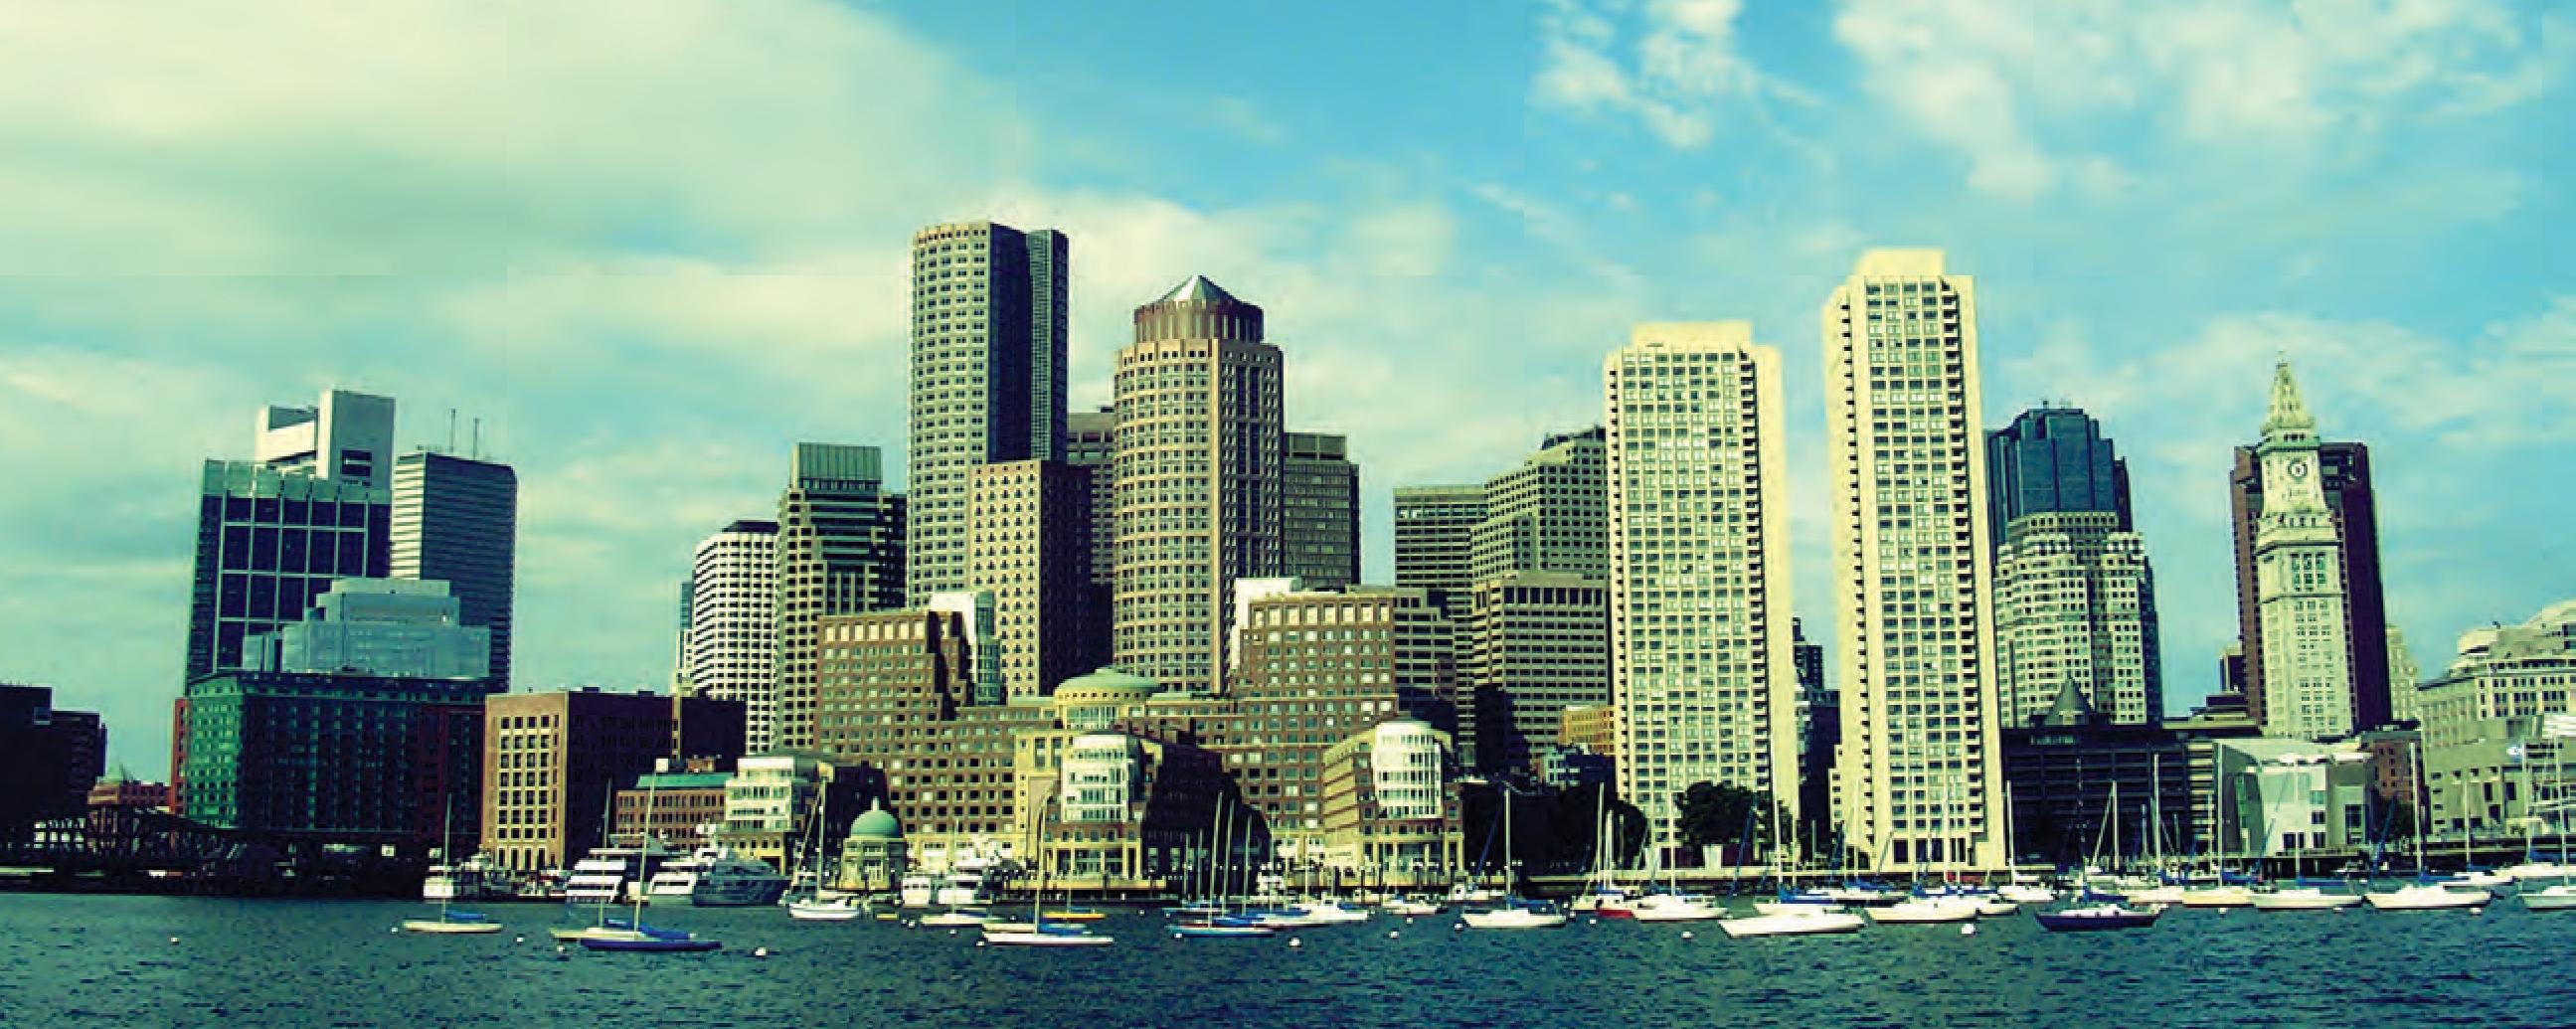 Boston City Skyline Silhouette Background Vector Illustration In 2020 Boston Skyline City Skyline Silhouette Skyline Silhouette